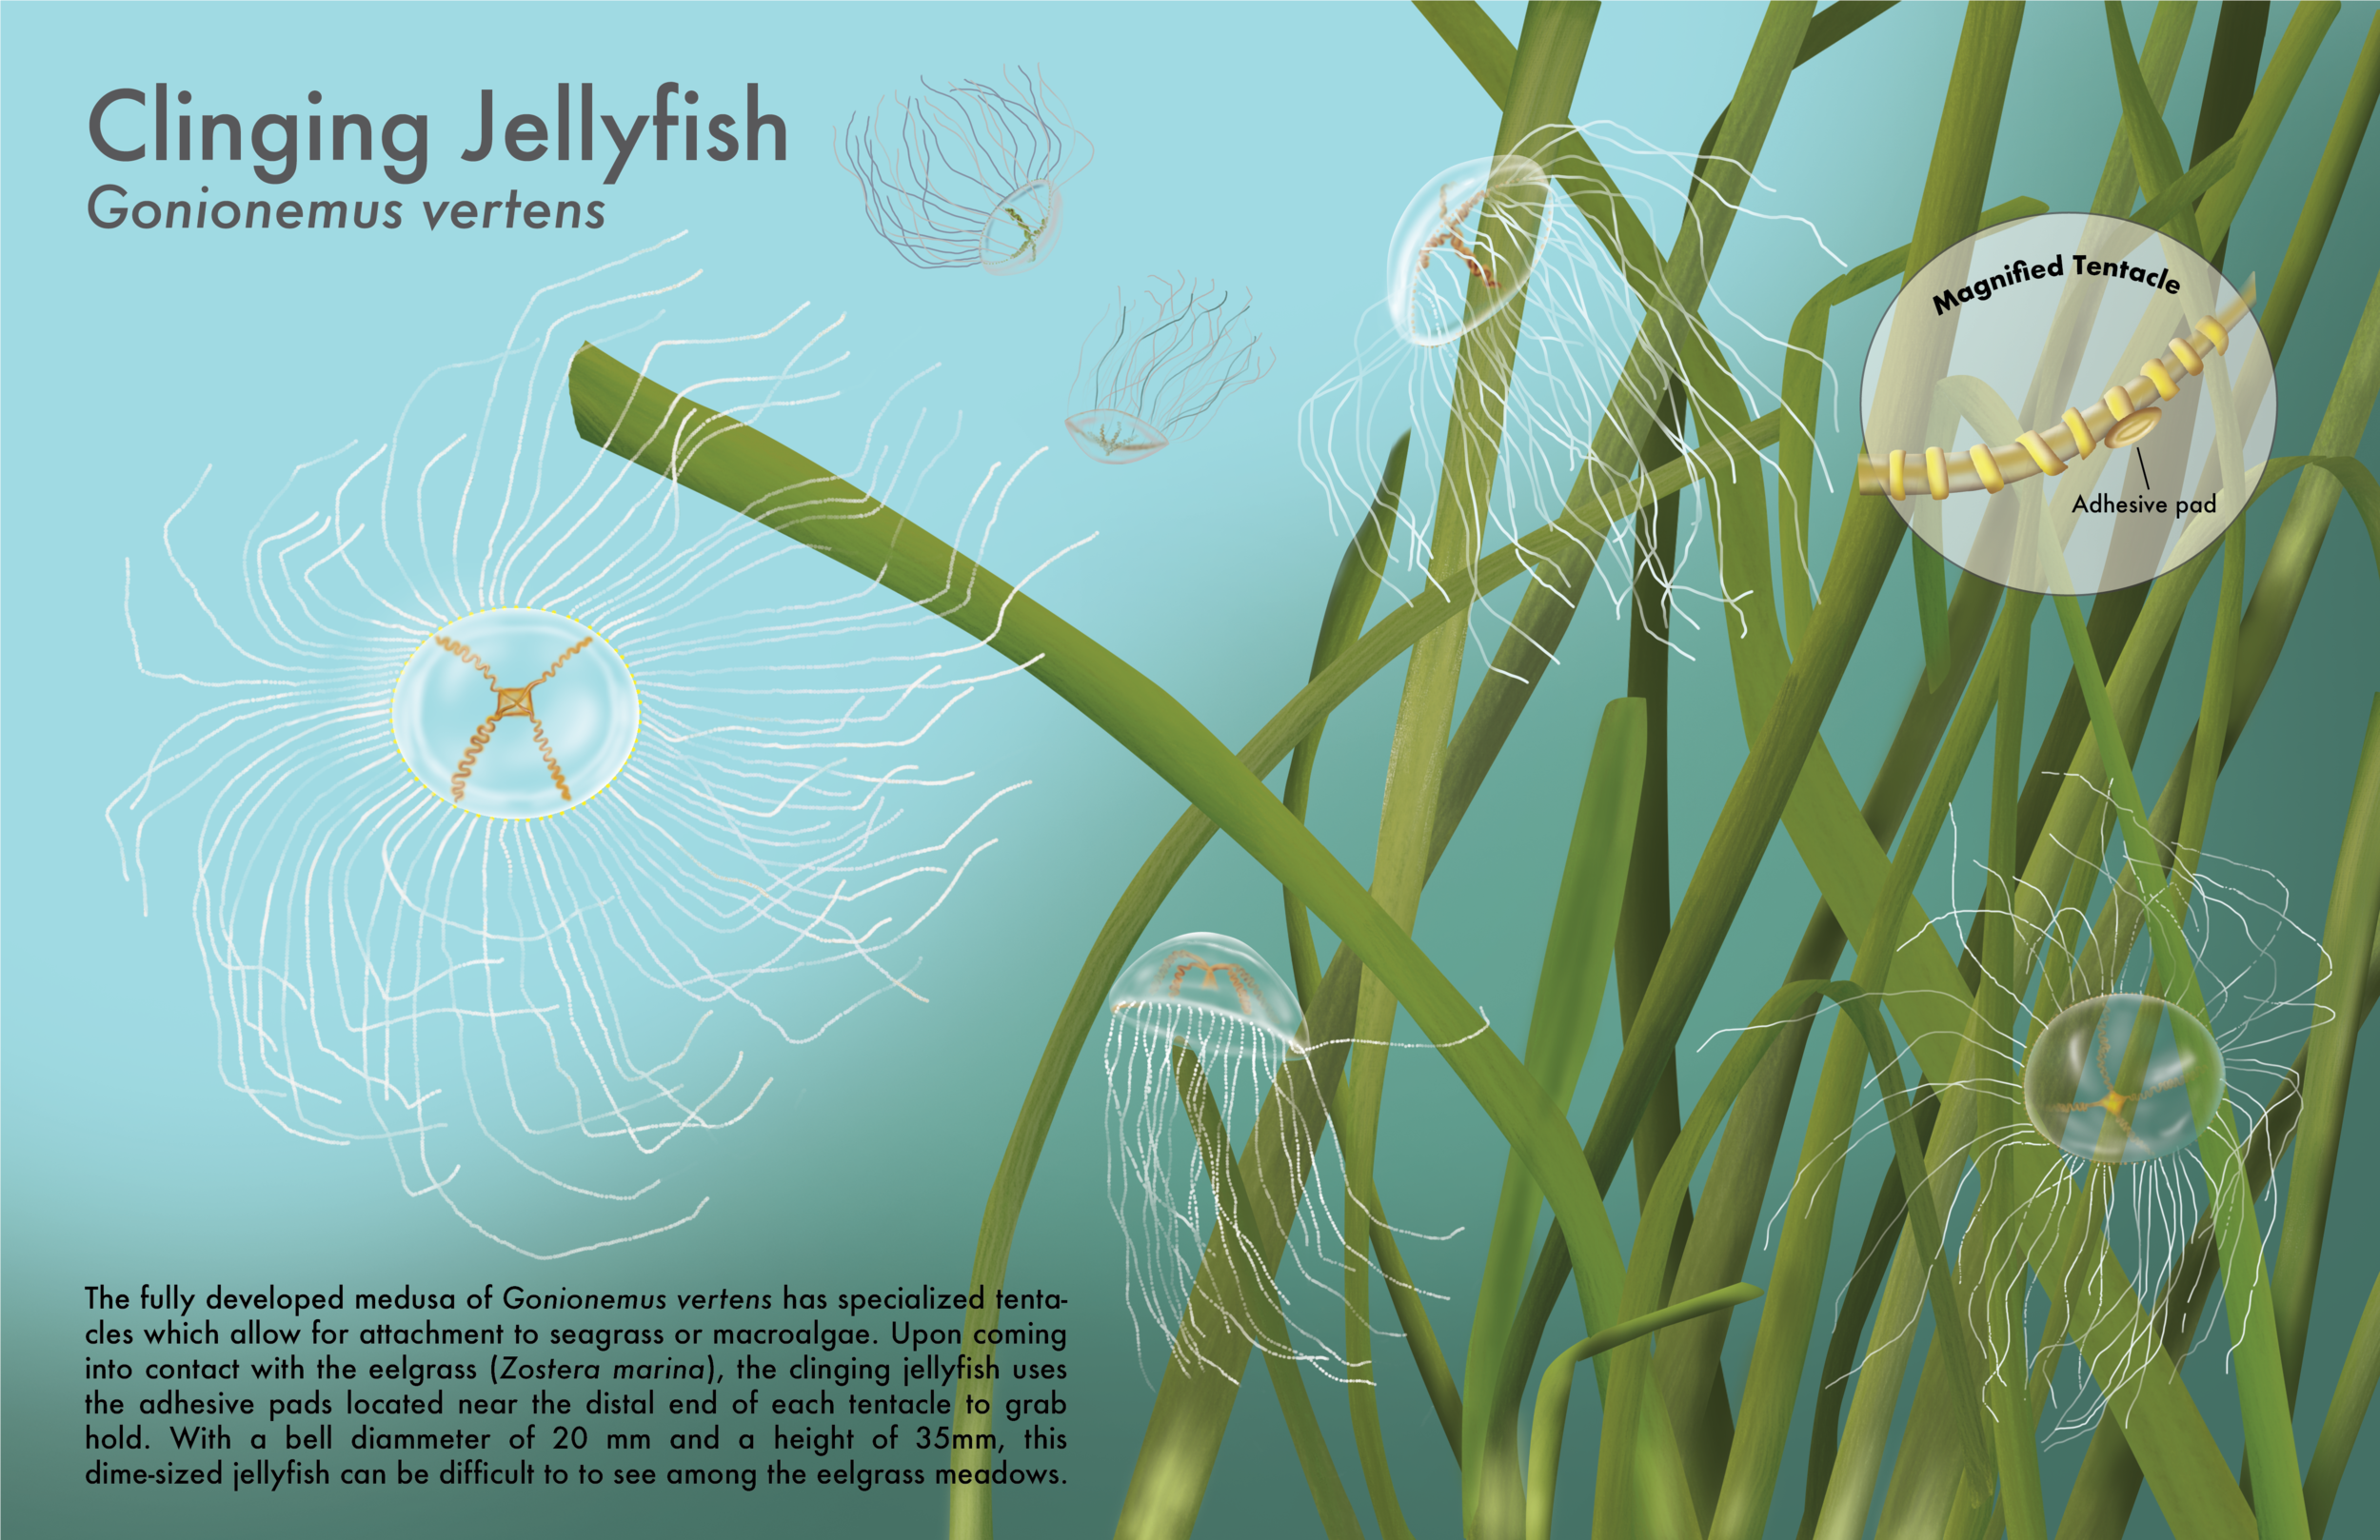 Clinging Jellyfish in Habitat